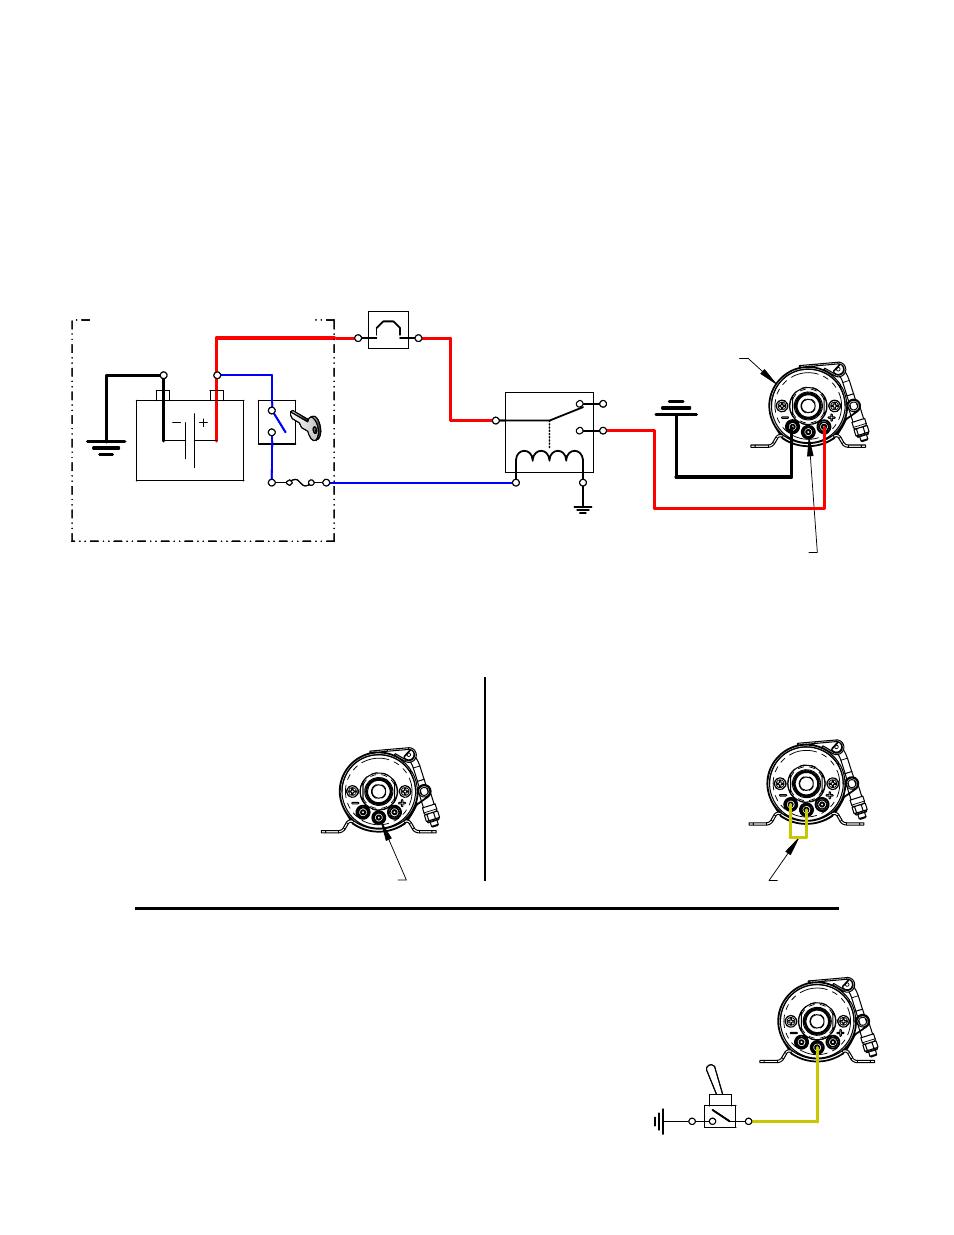 Main Wiring Schematic Diagram Speed Control Diagrams Speedcontrolcircuitjpg Fuelab 41404 Prodigy Fuel Pump Carbureted